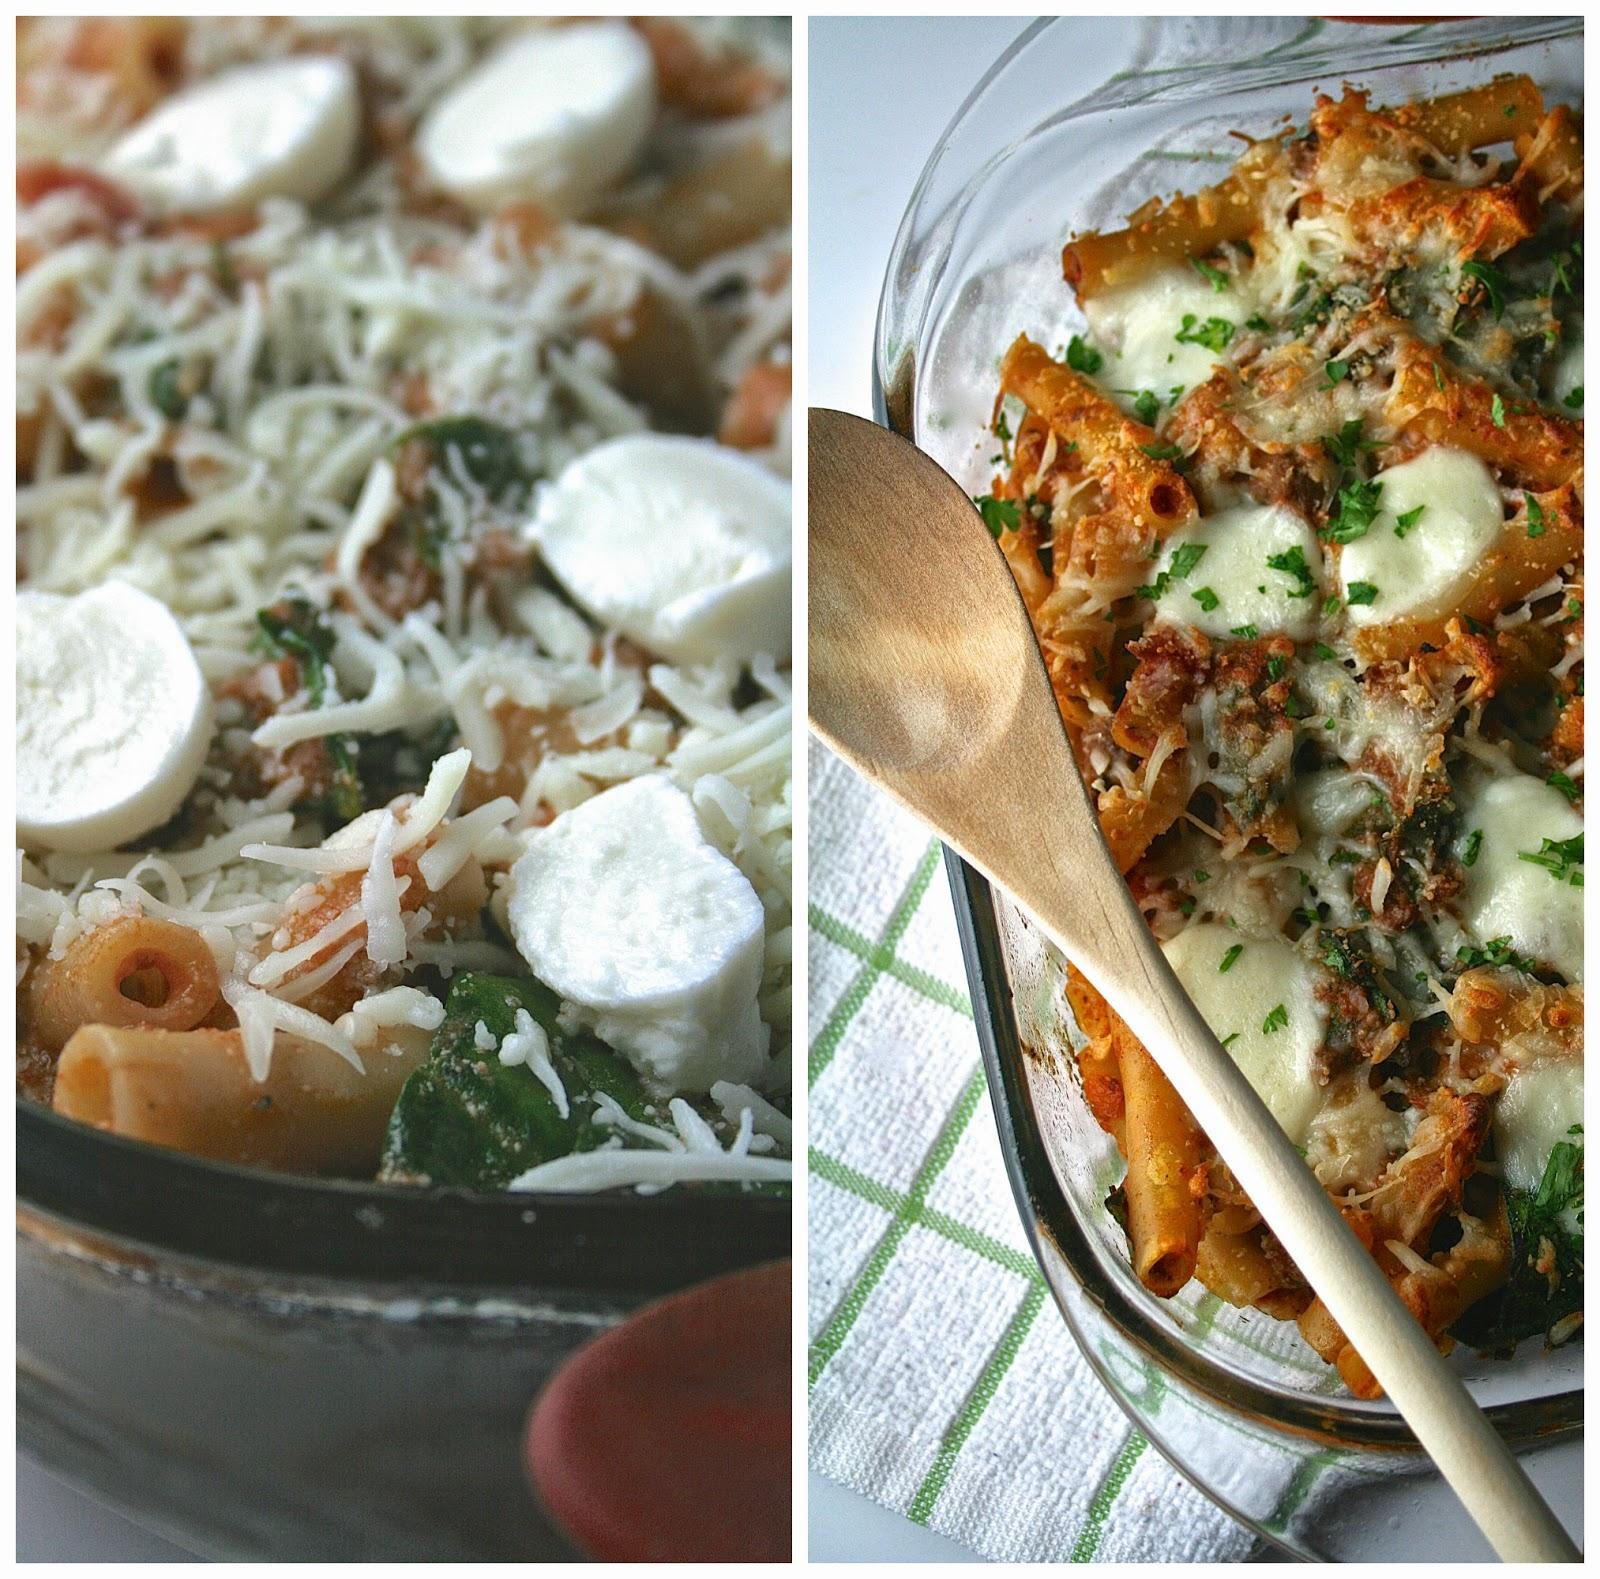 Lasagna-Style Baked Ziti | Oregon Transplant | Bloglovin'